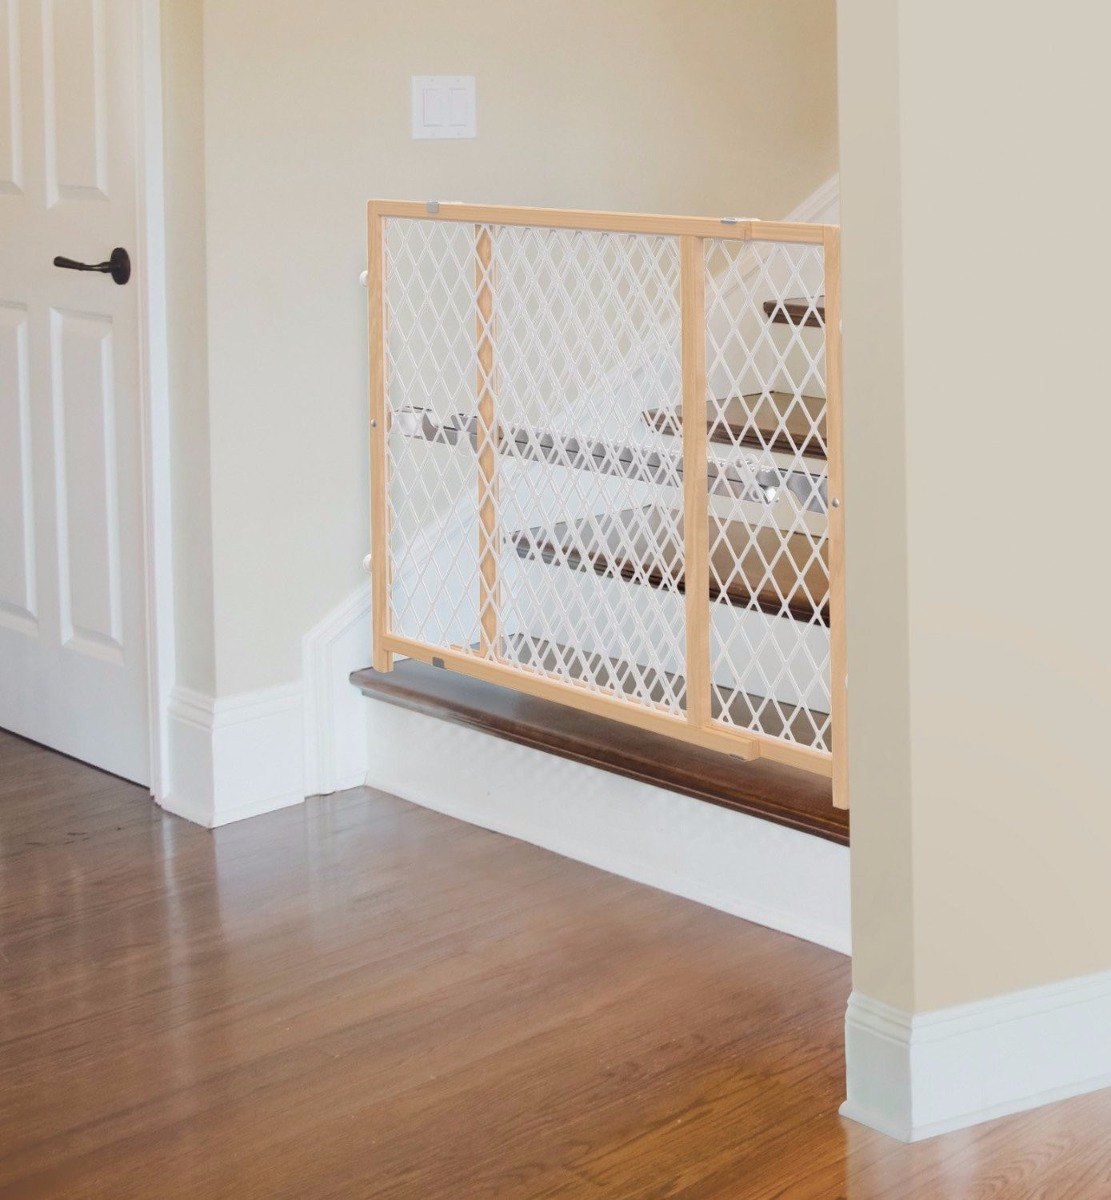 Reja puerta de seguridad para bebe o mascota barandal - Seguro para puertas bebe ...